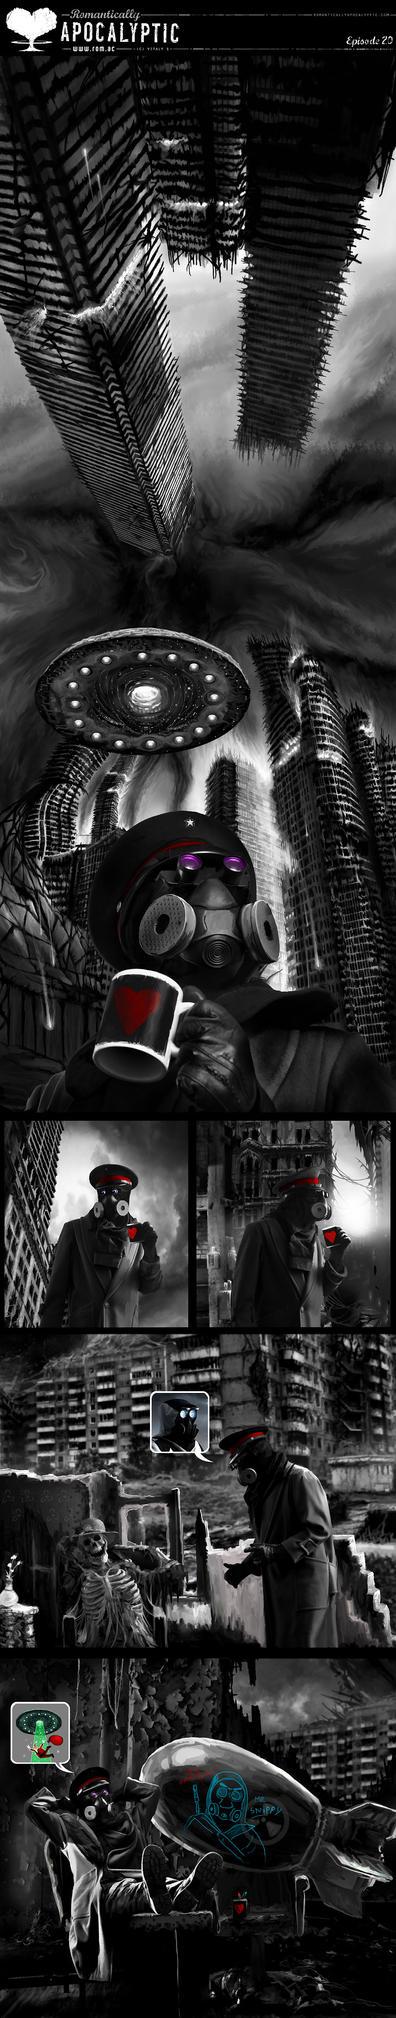 Romantically Apocalyptic 20 by alexiuss